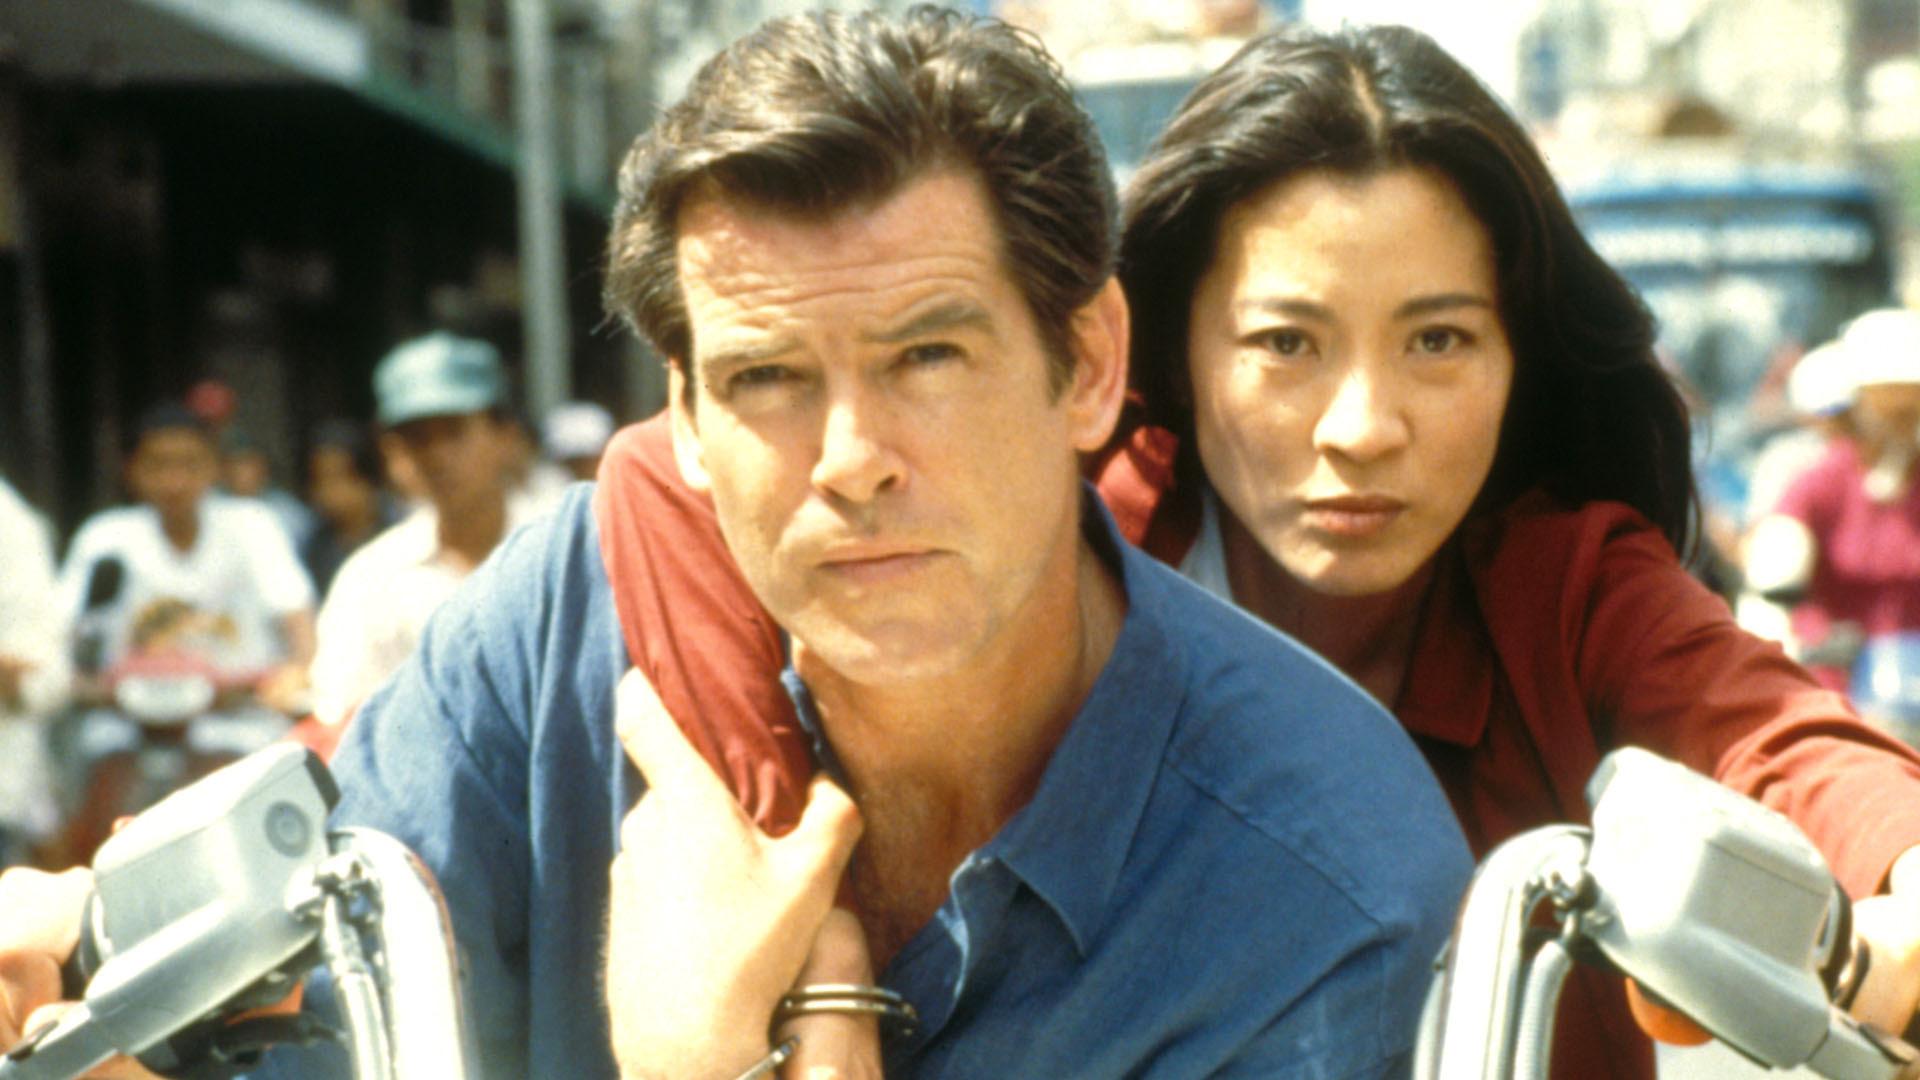 James Bond Movies  Reviews amp Age Ratings